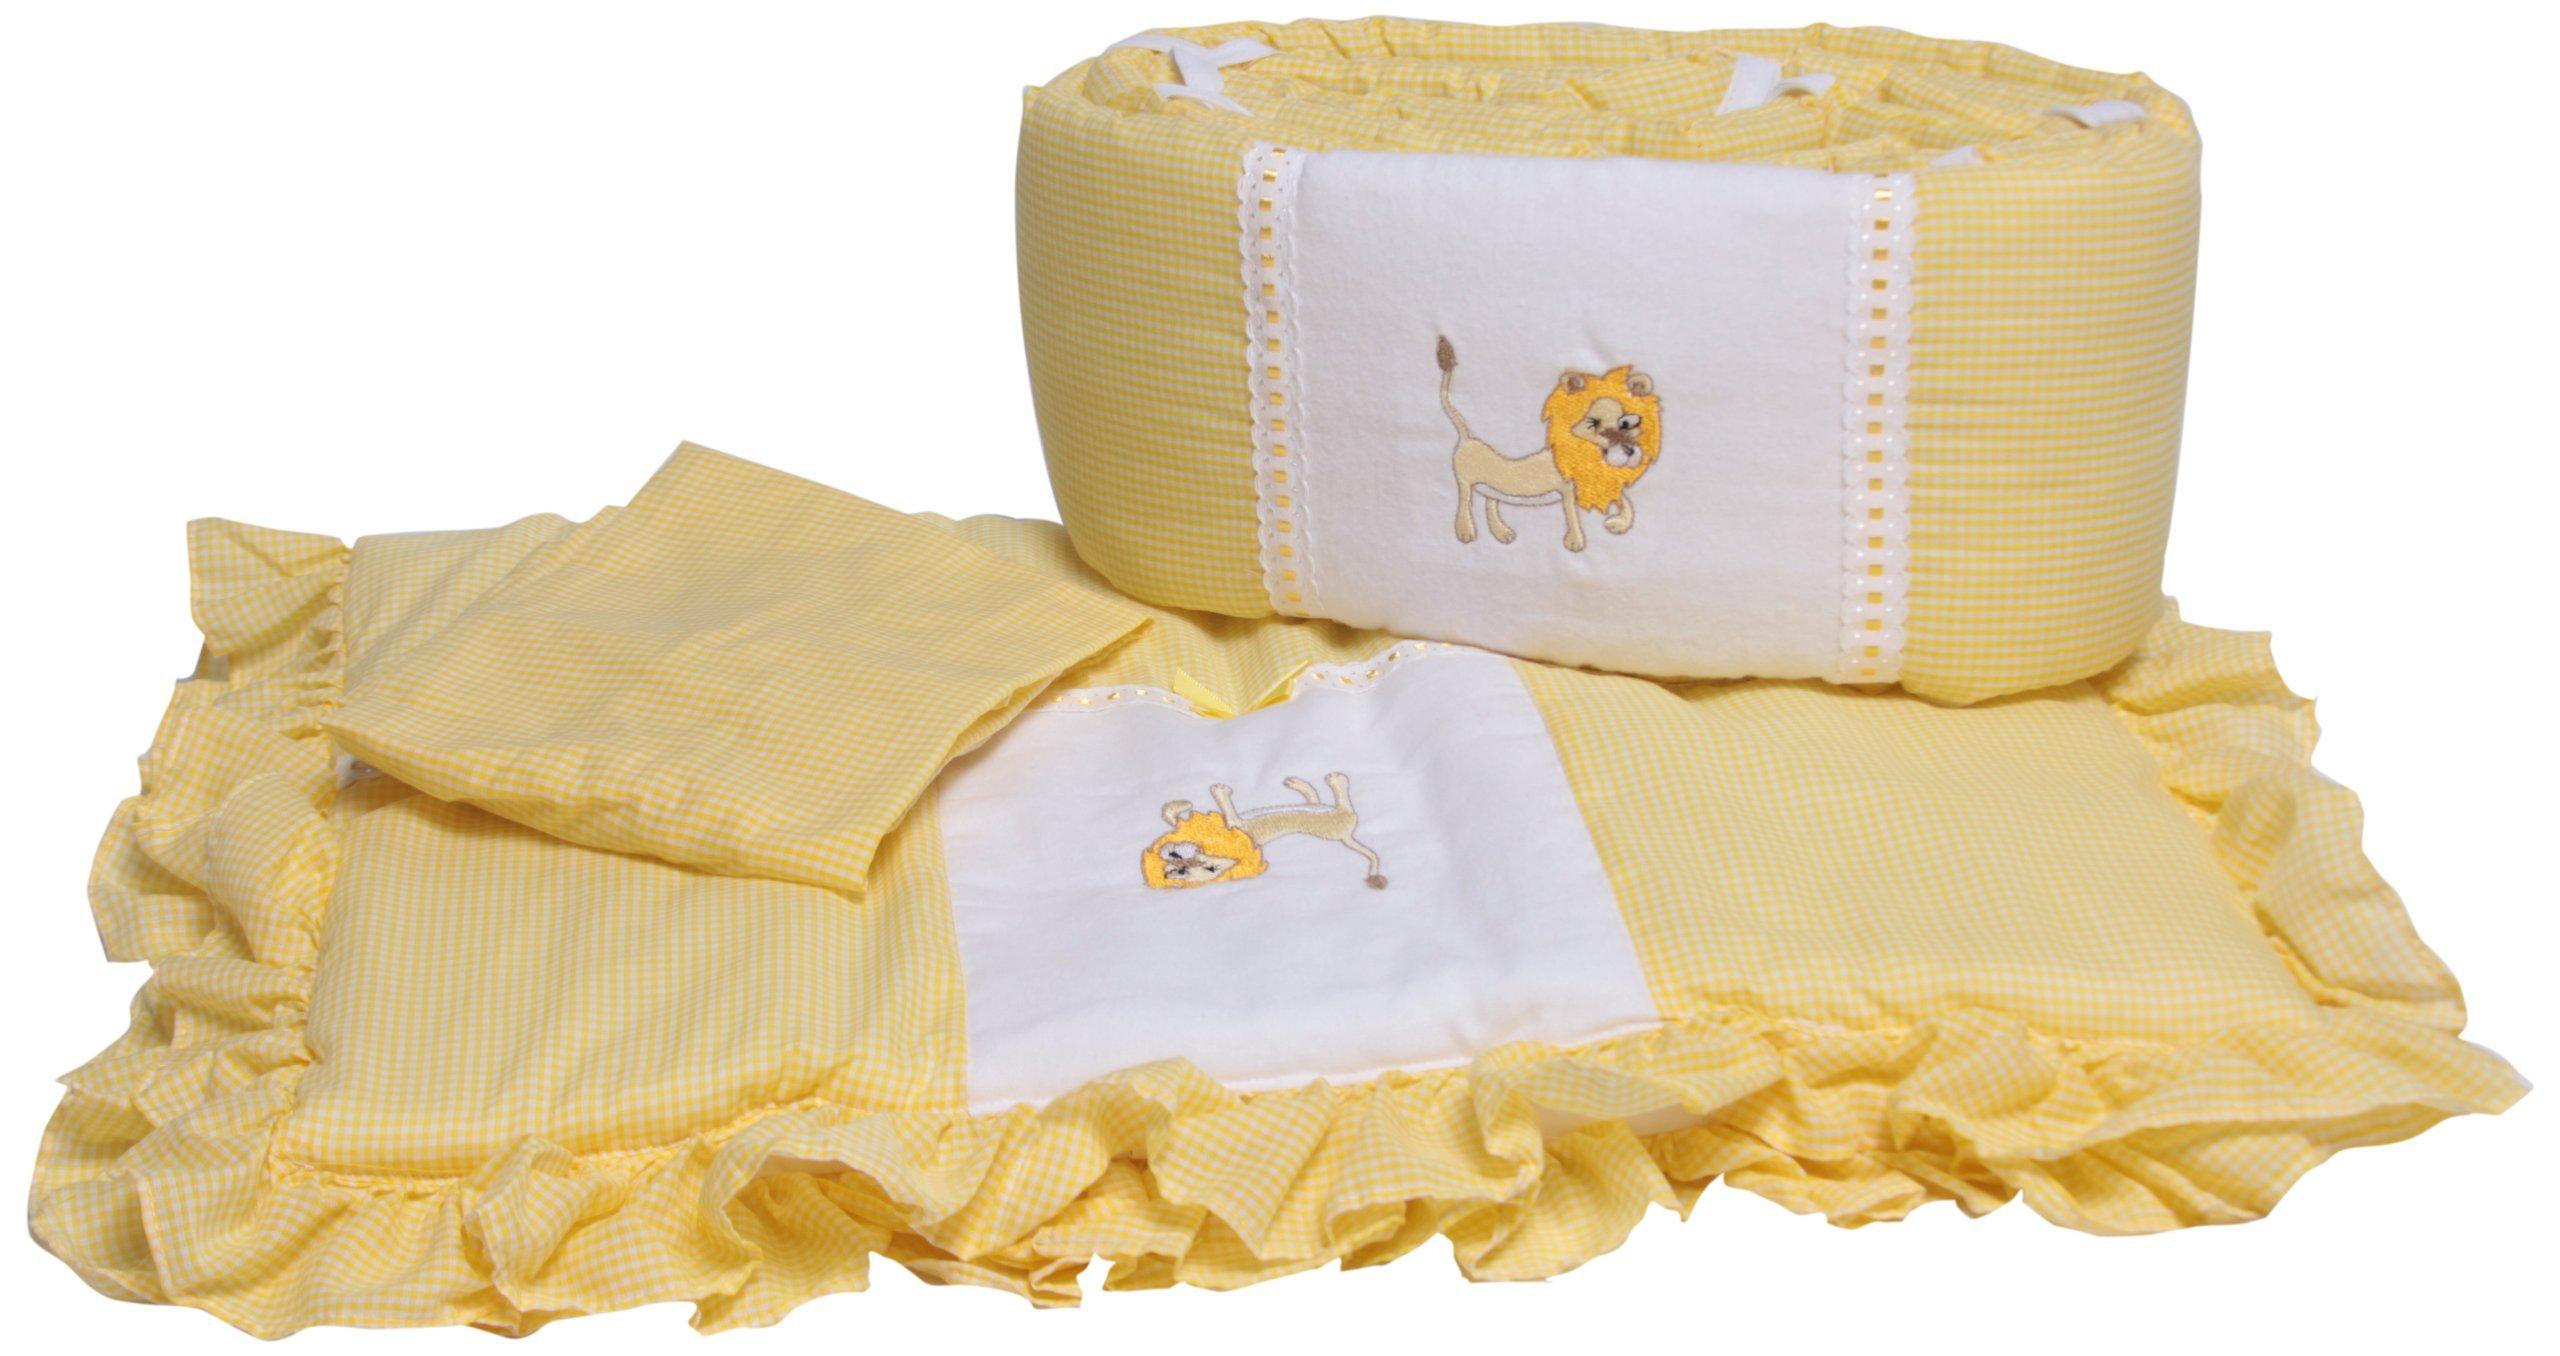 Baby Doll Bedding Gingham Applique Cradle Bedding Set, Lion by BabyDoll Bedding